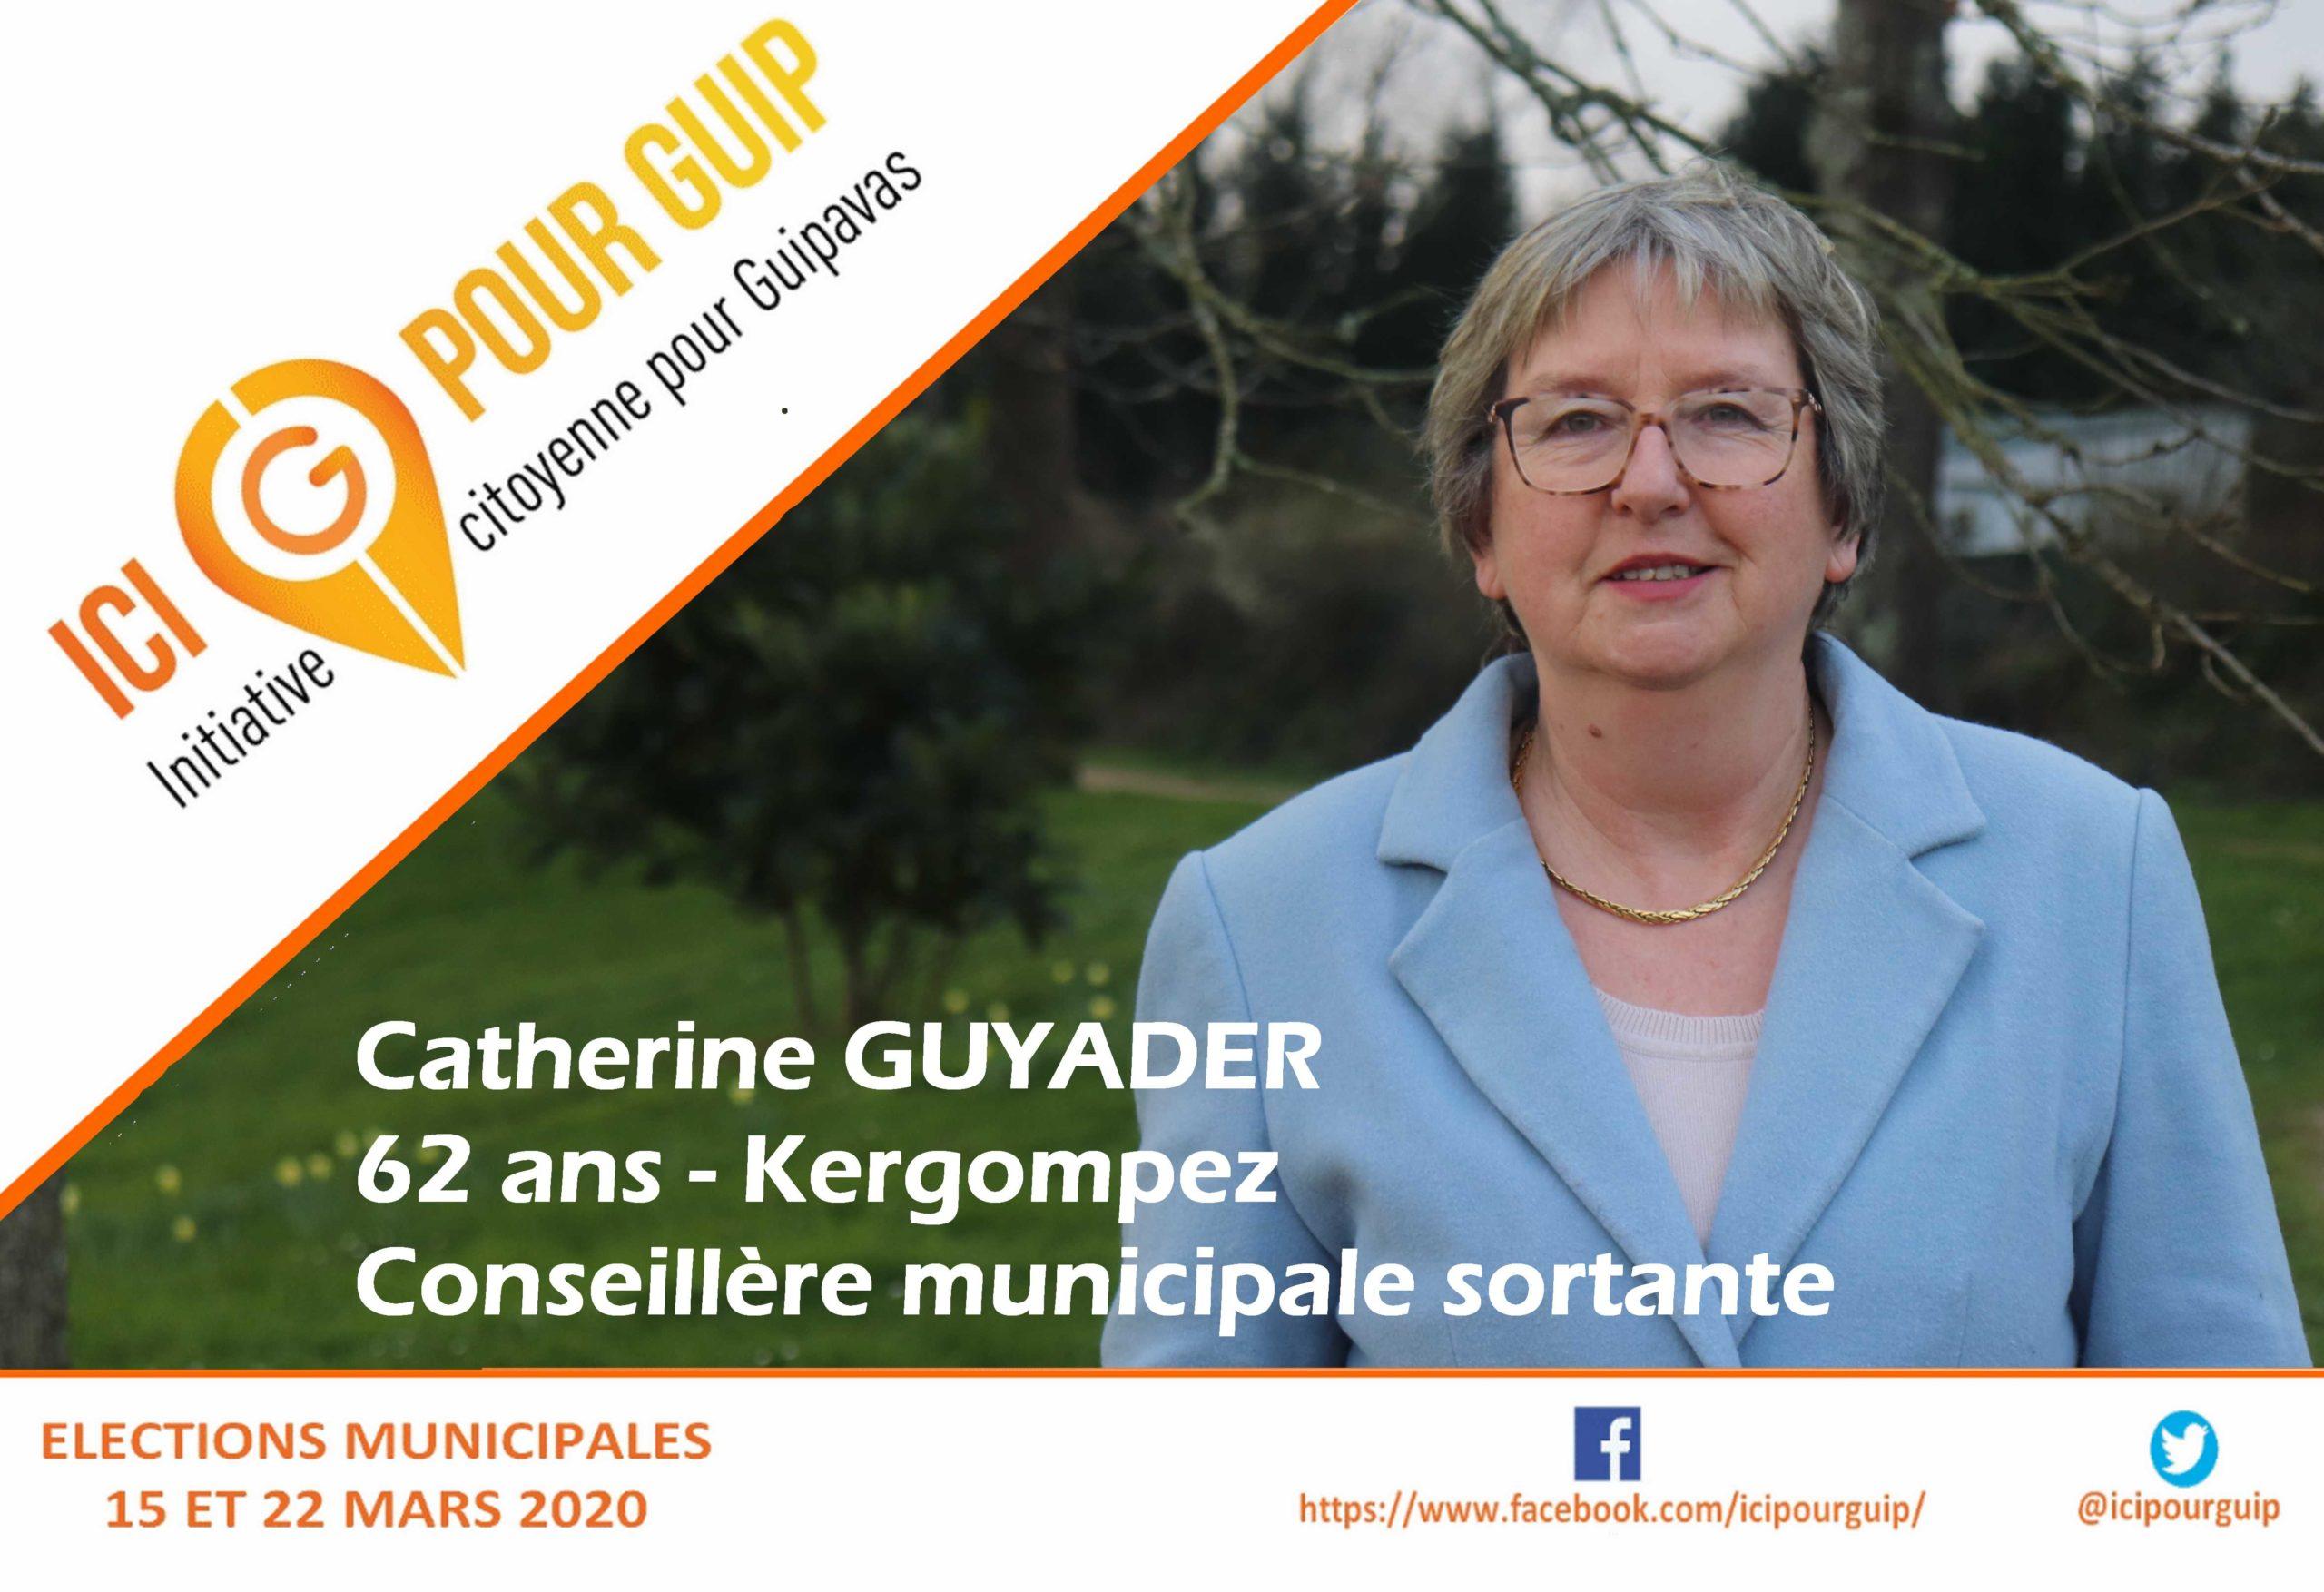 Catherine Guyader